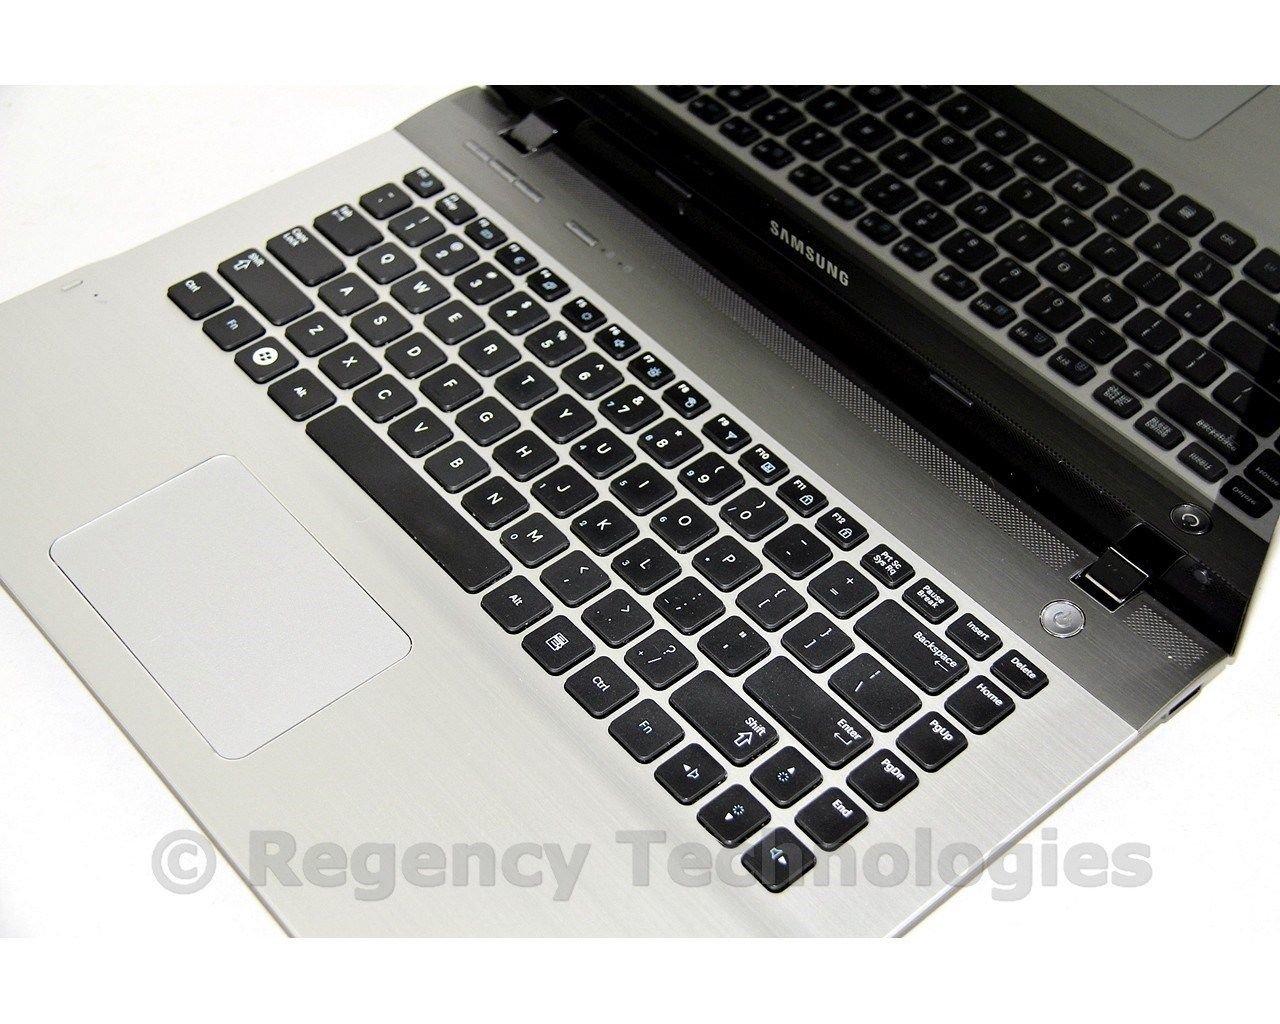 Laptop samsung 300e precio mexico - Amazon Com Samsung Laptop Intel Core I5 Processor 14 Display 4gb M Computers Accessories